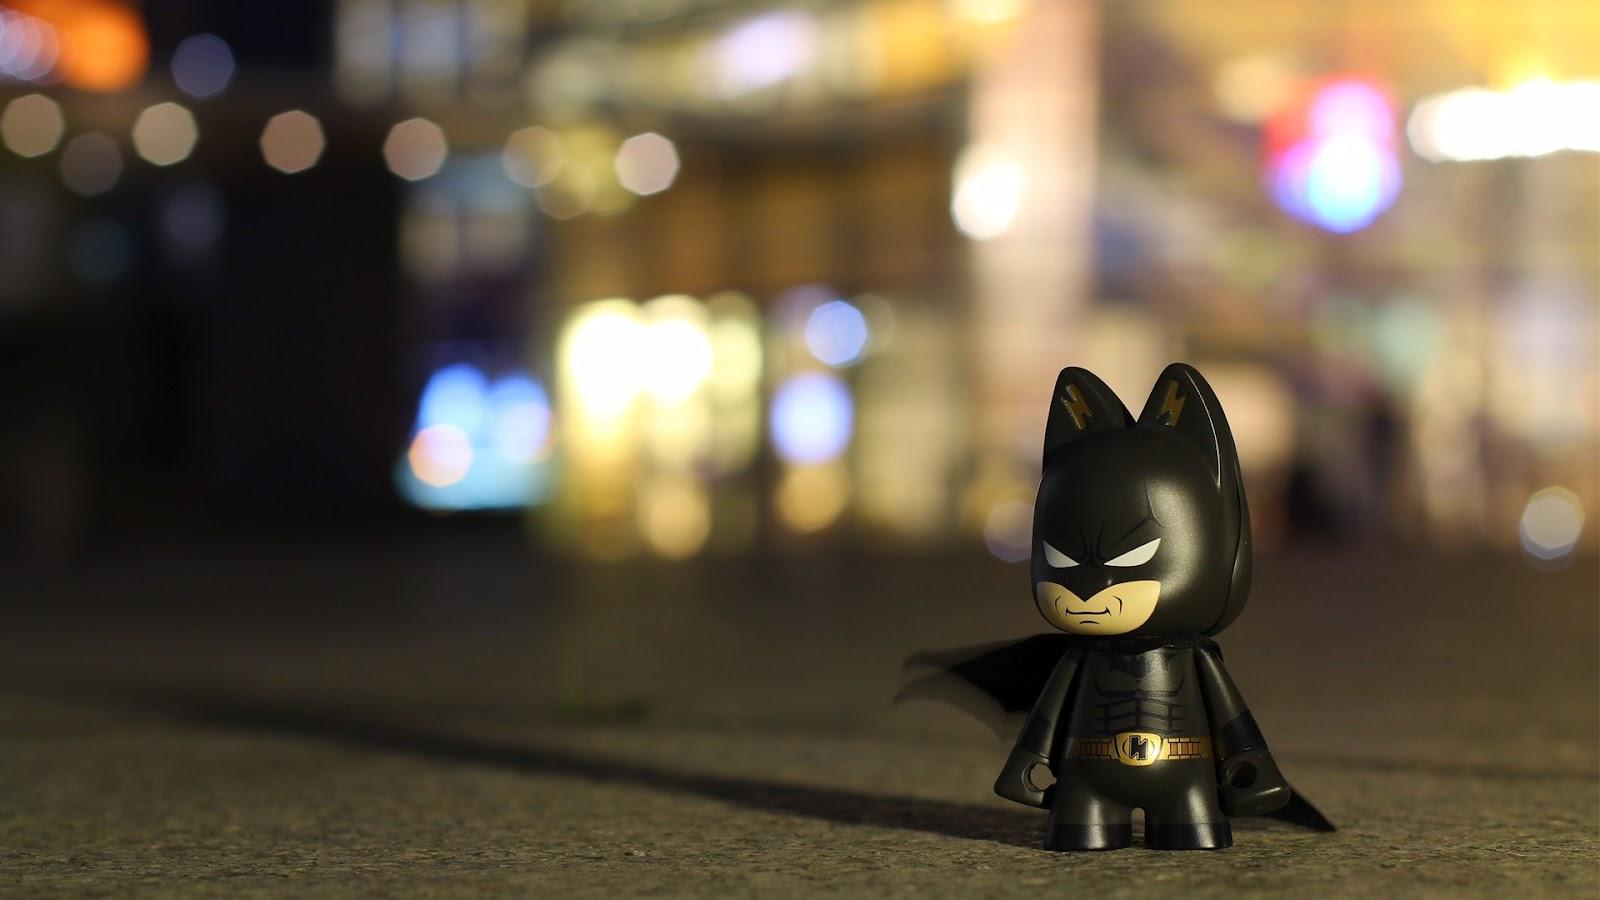 free wallpicz: Batman Desktop Wallpaper Hd